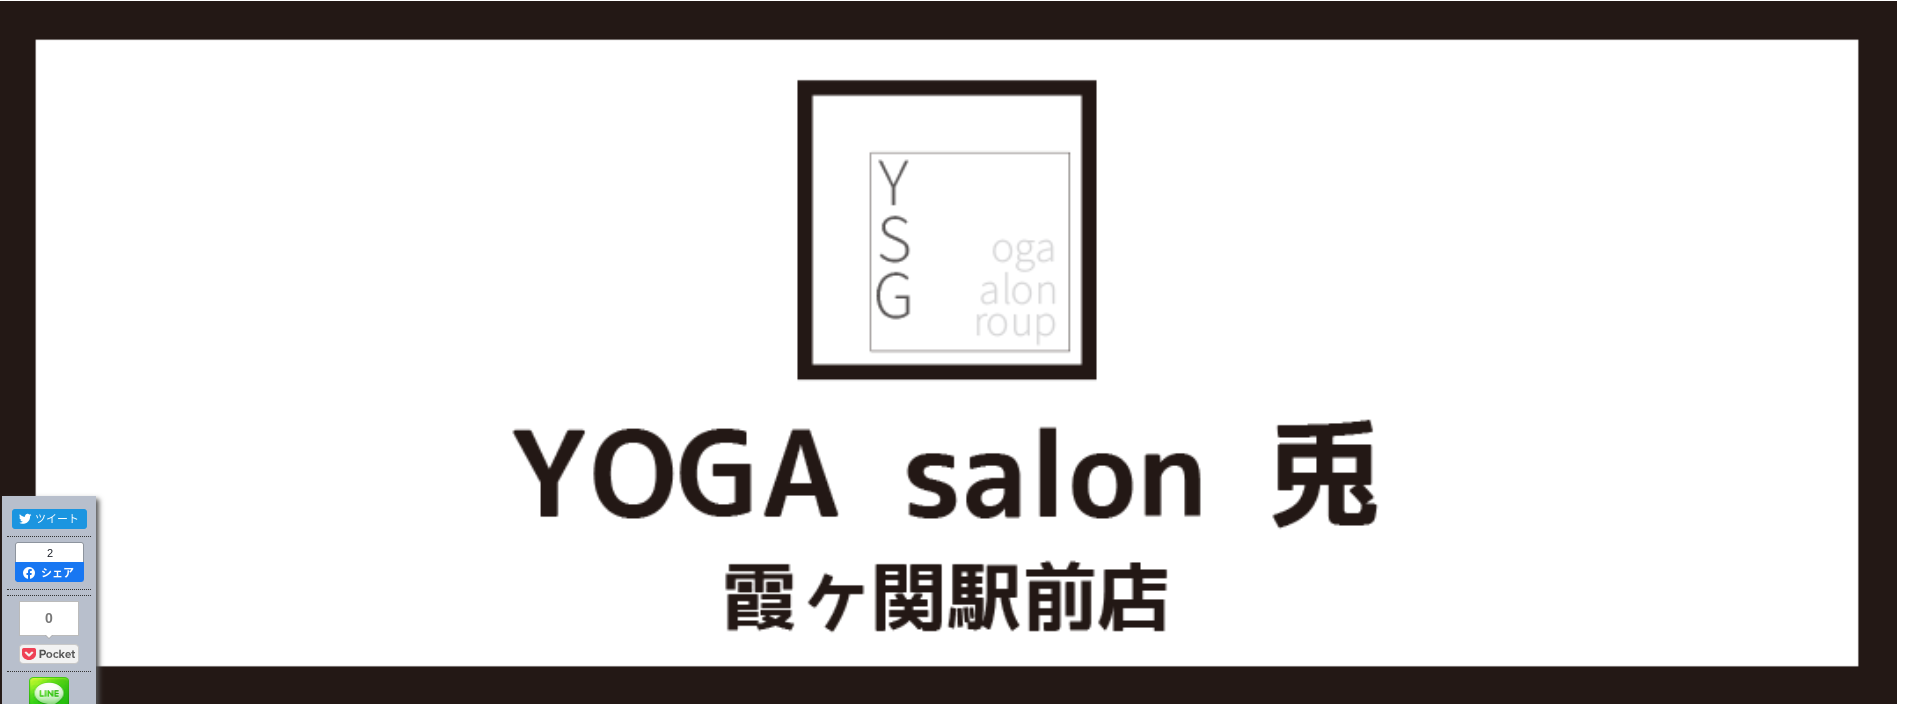 YOGAsalon兎 川越霞ヶ関店の施設画像